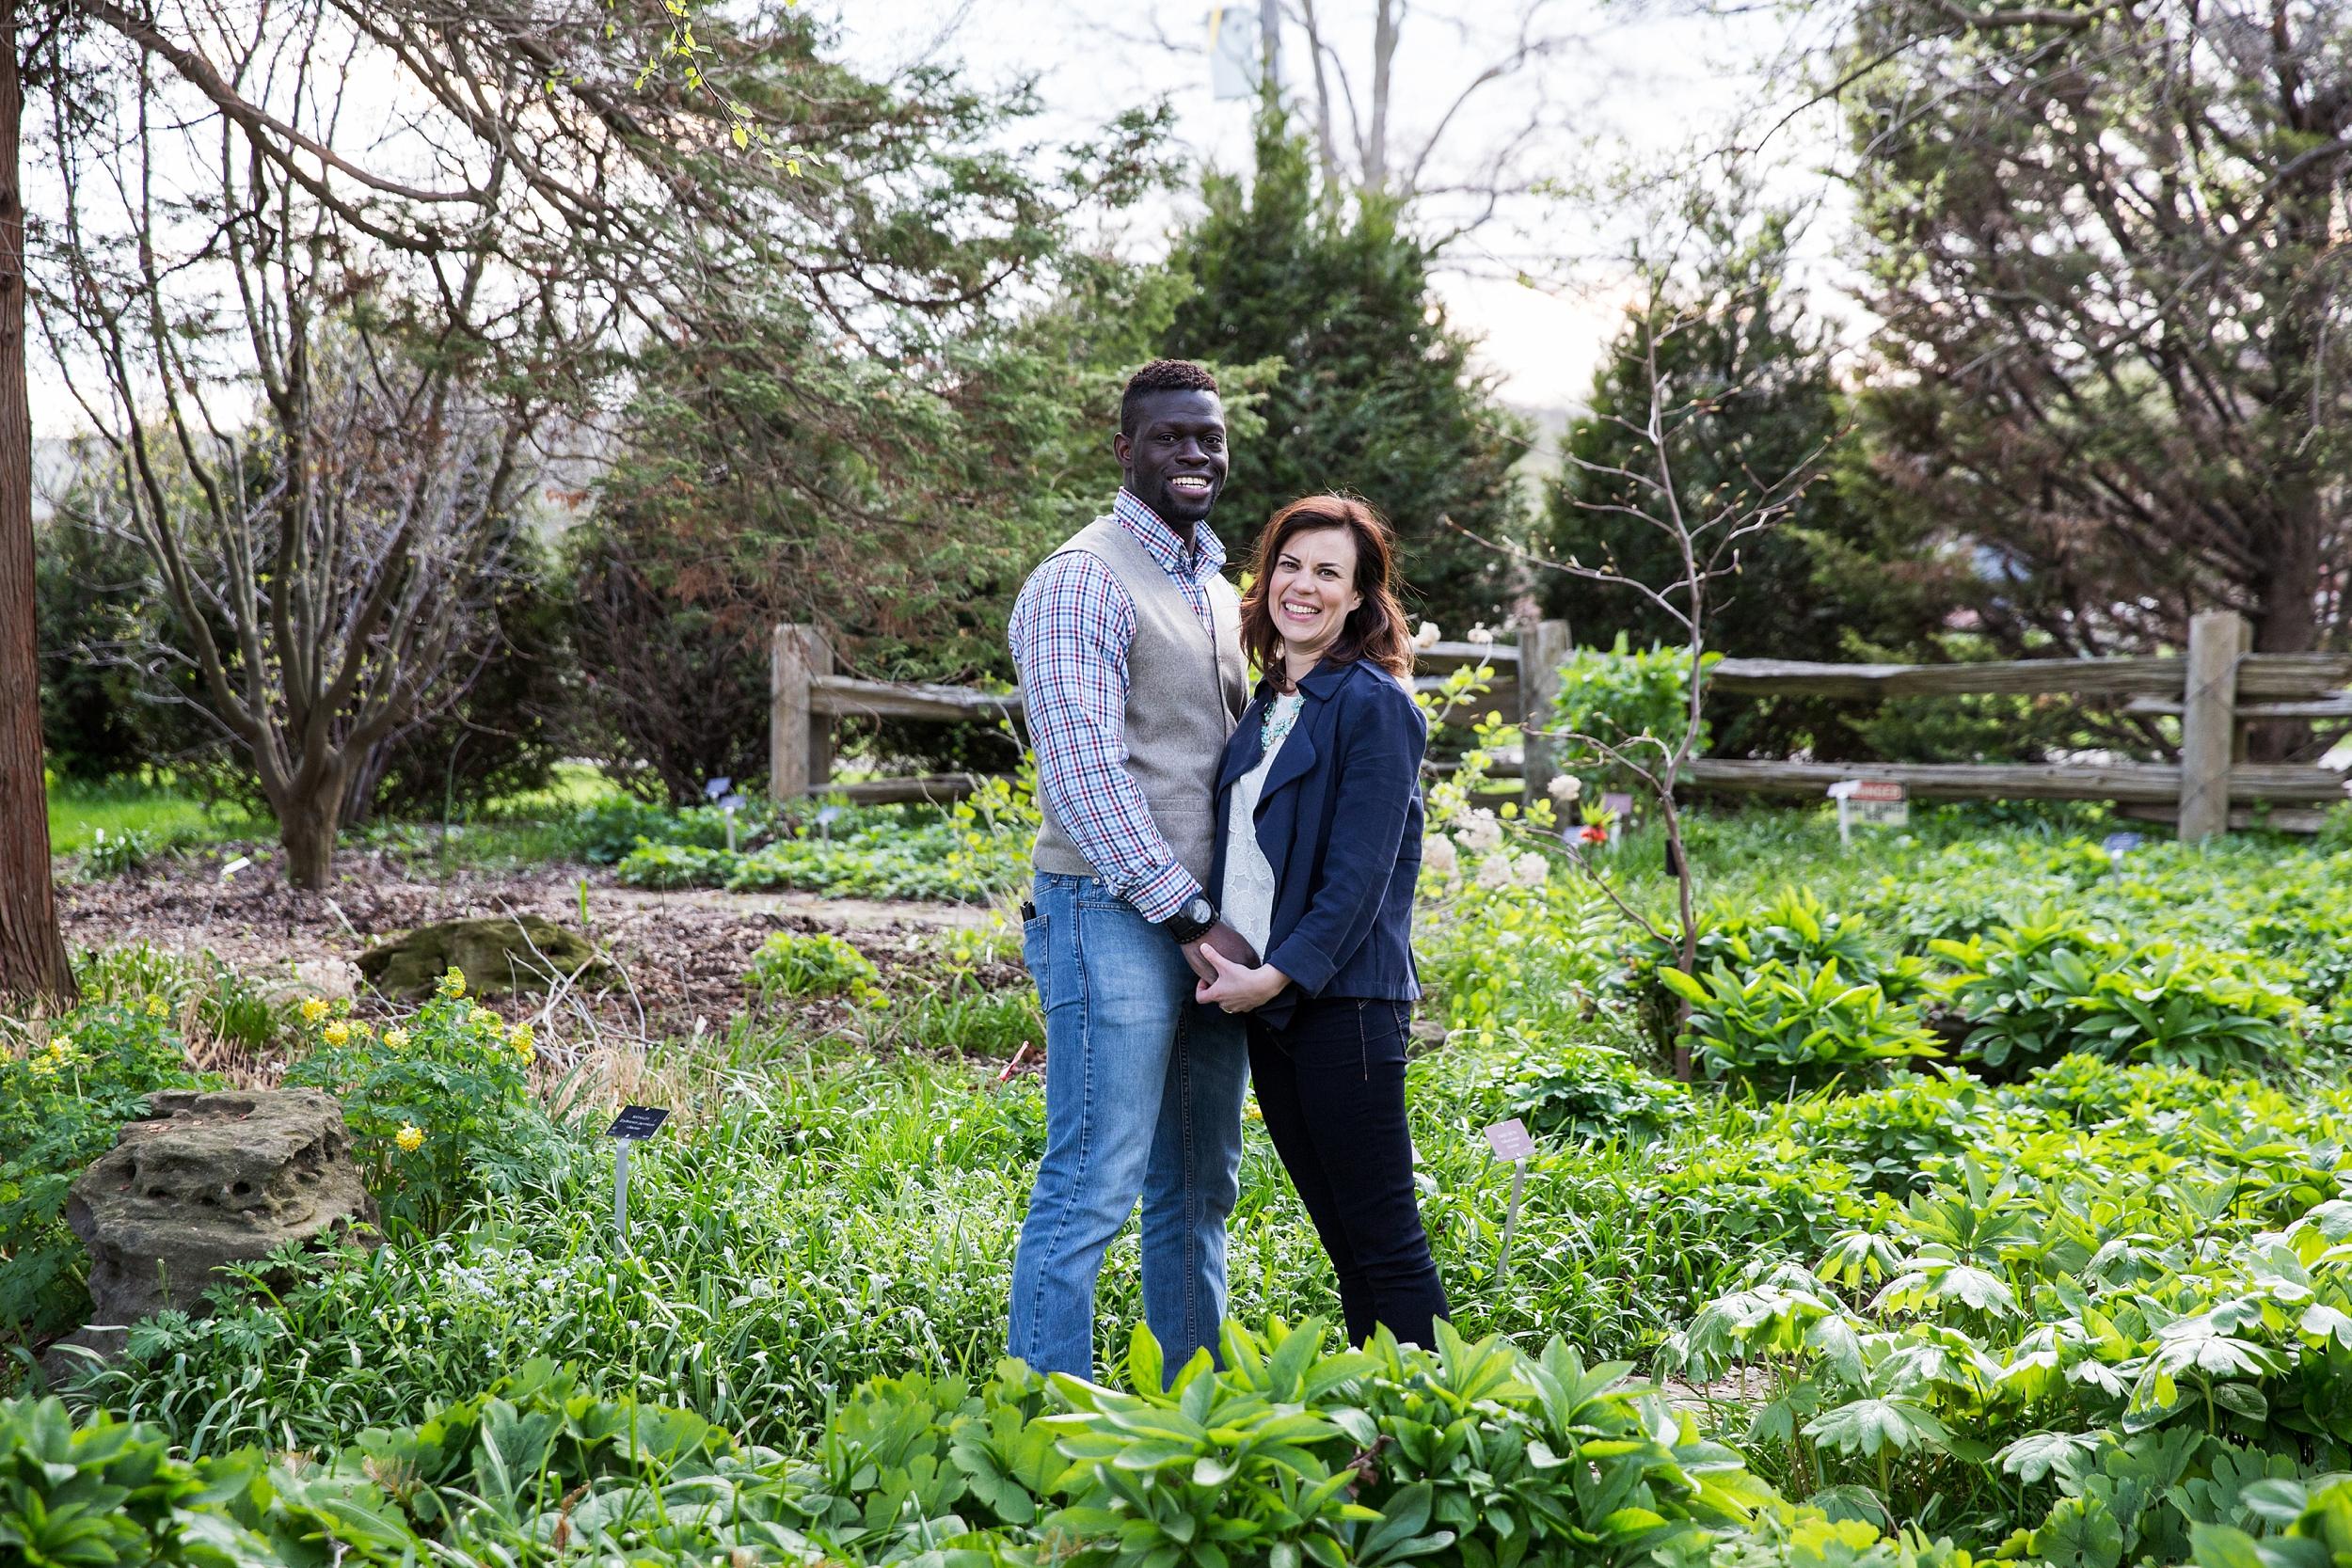 niagarafallsbotanical gardens-engagement_0025.jpg